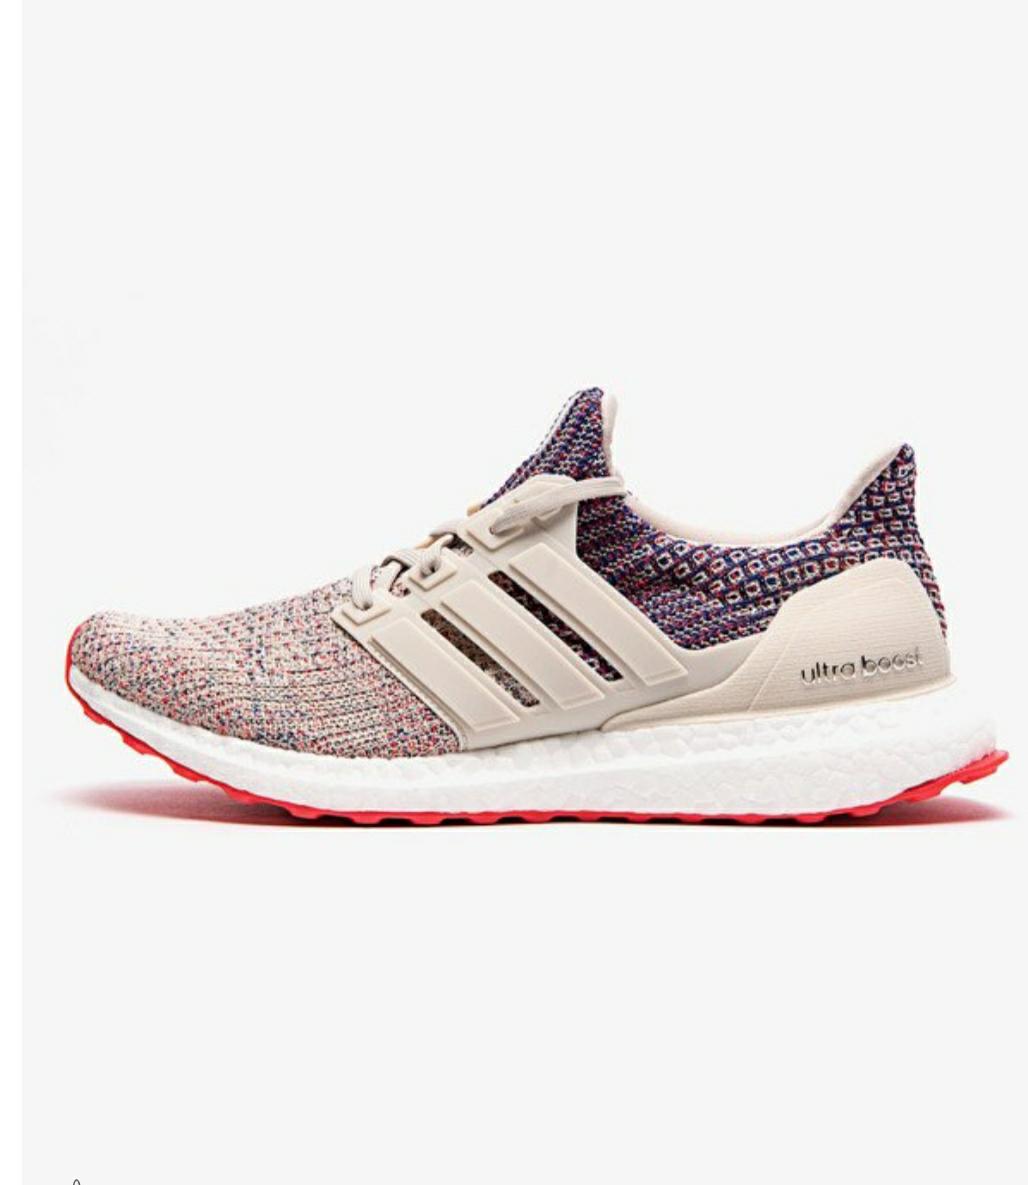 Zapatos Ultraboost Adidas